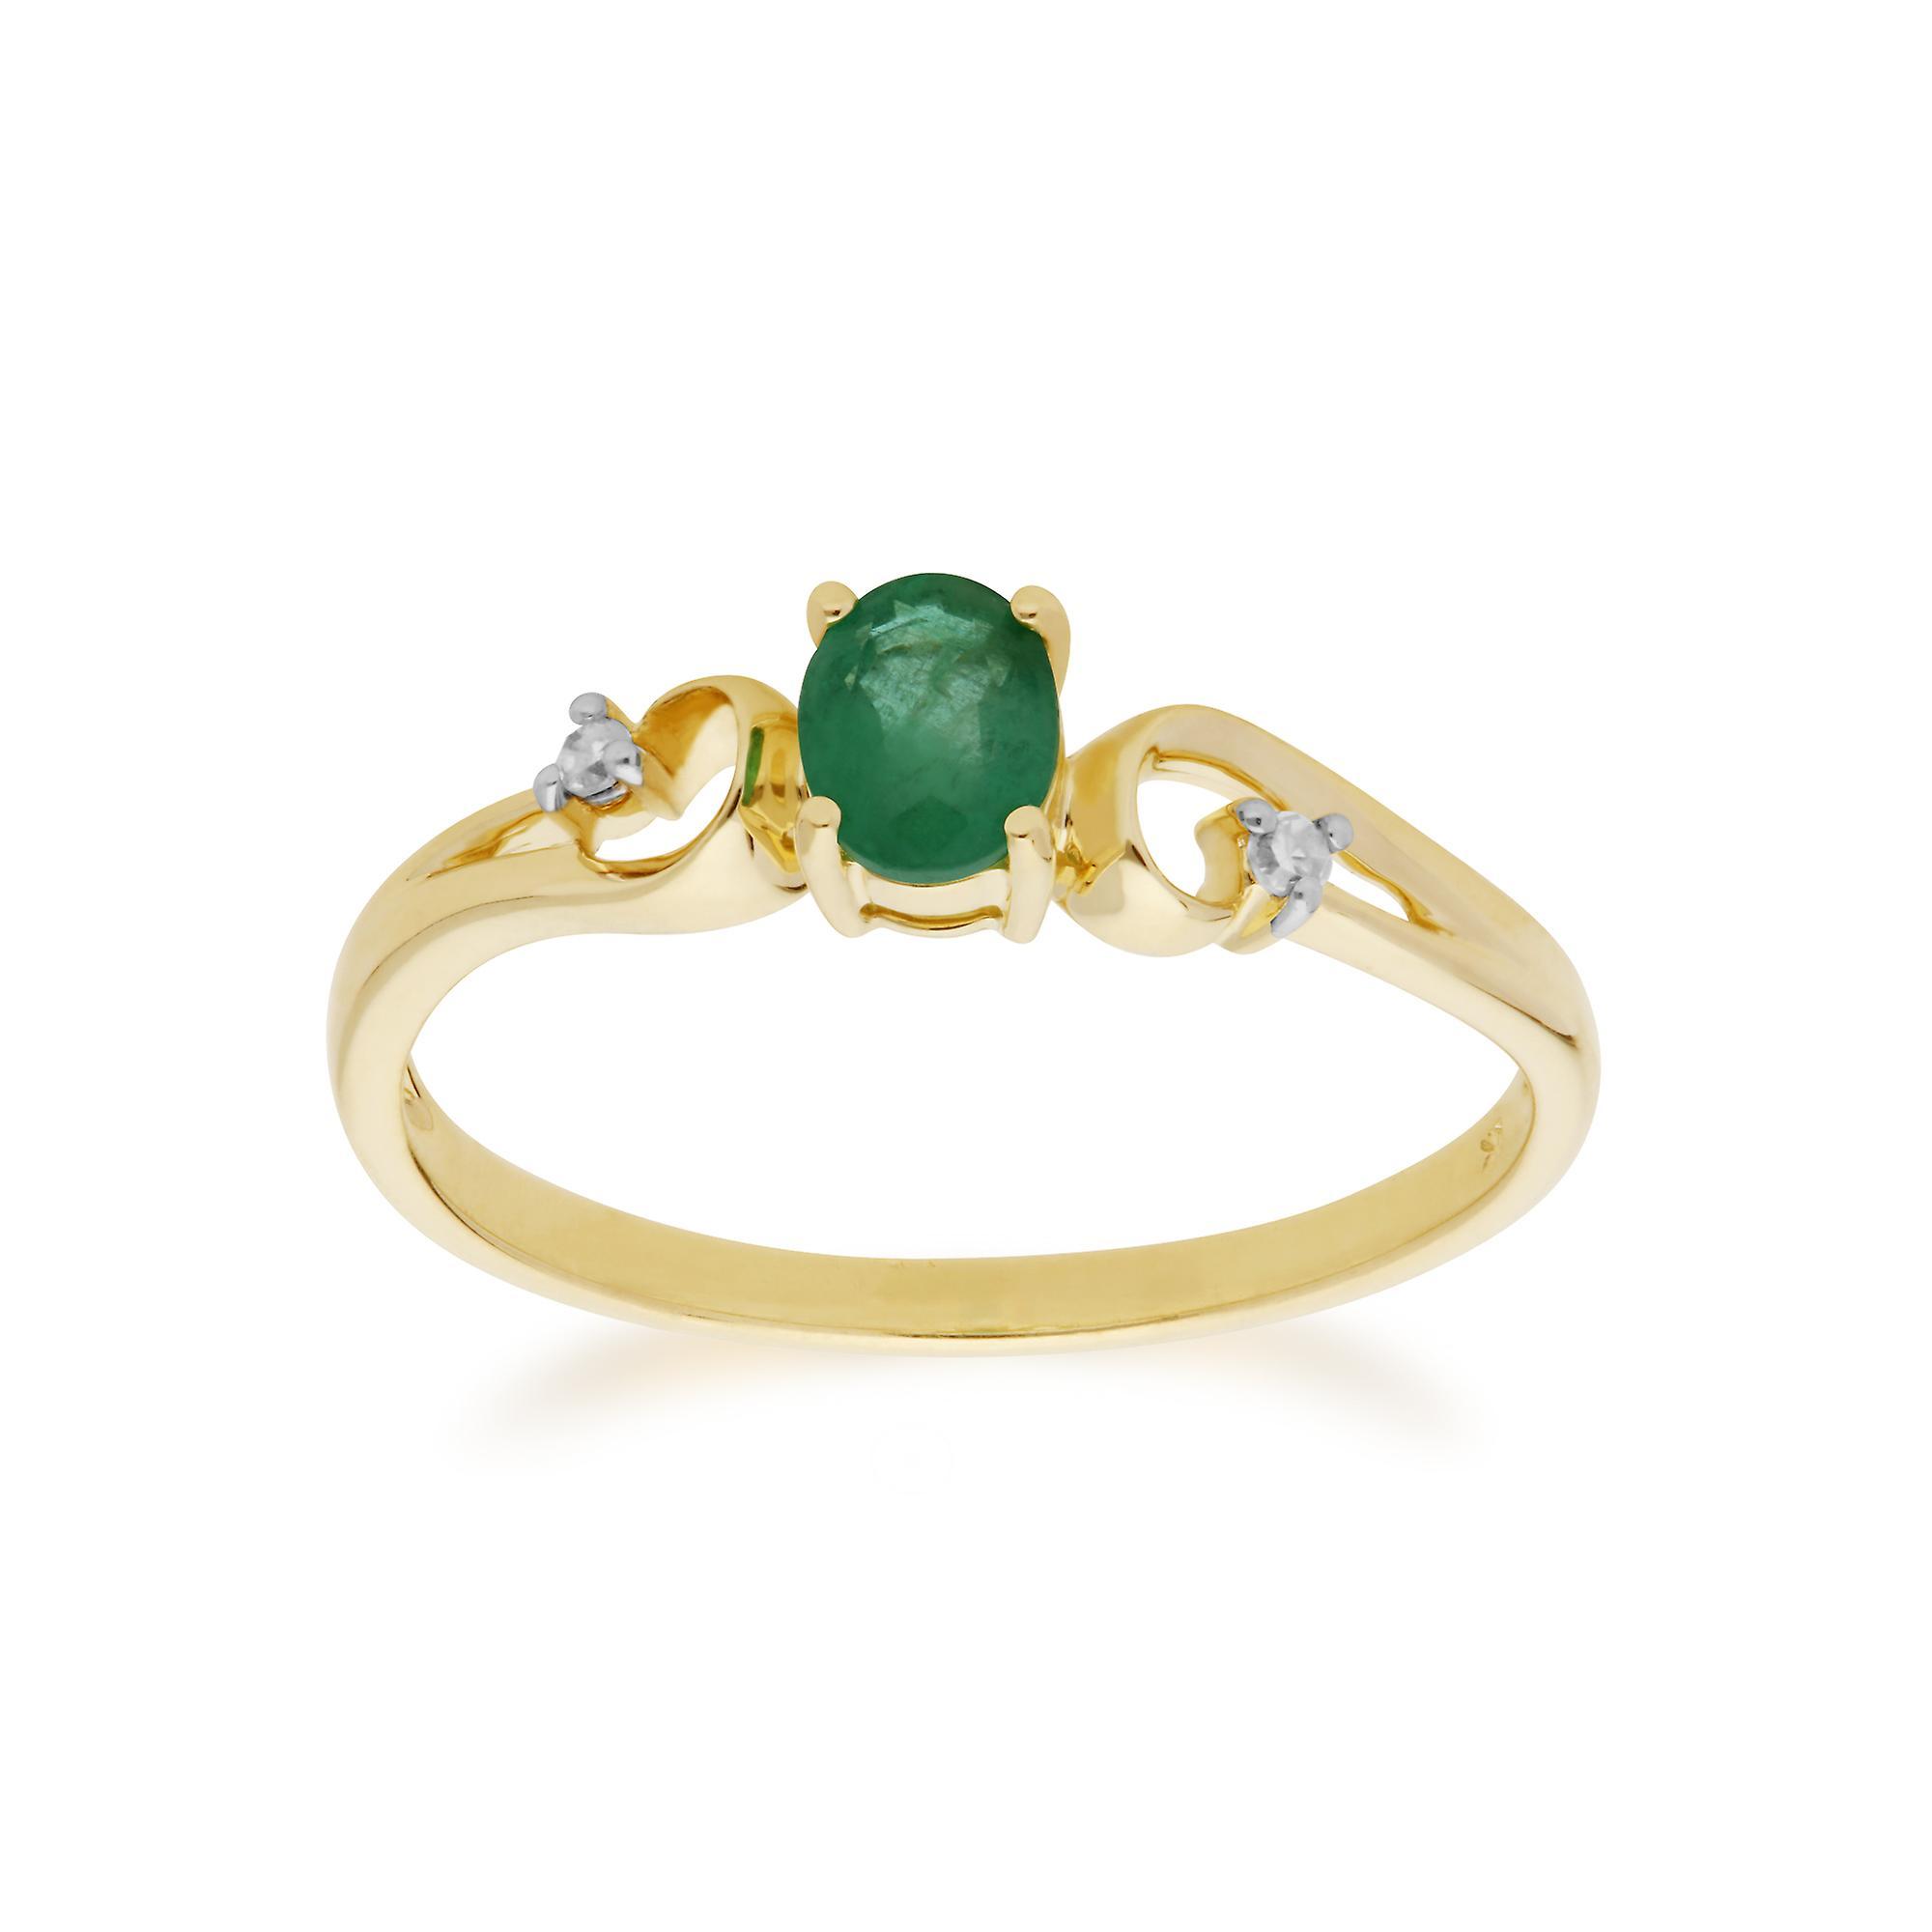 Gemondo 9ct Yellow Gold Emerald & Diamond Classic Dress Solitaire Ring